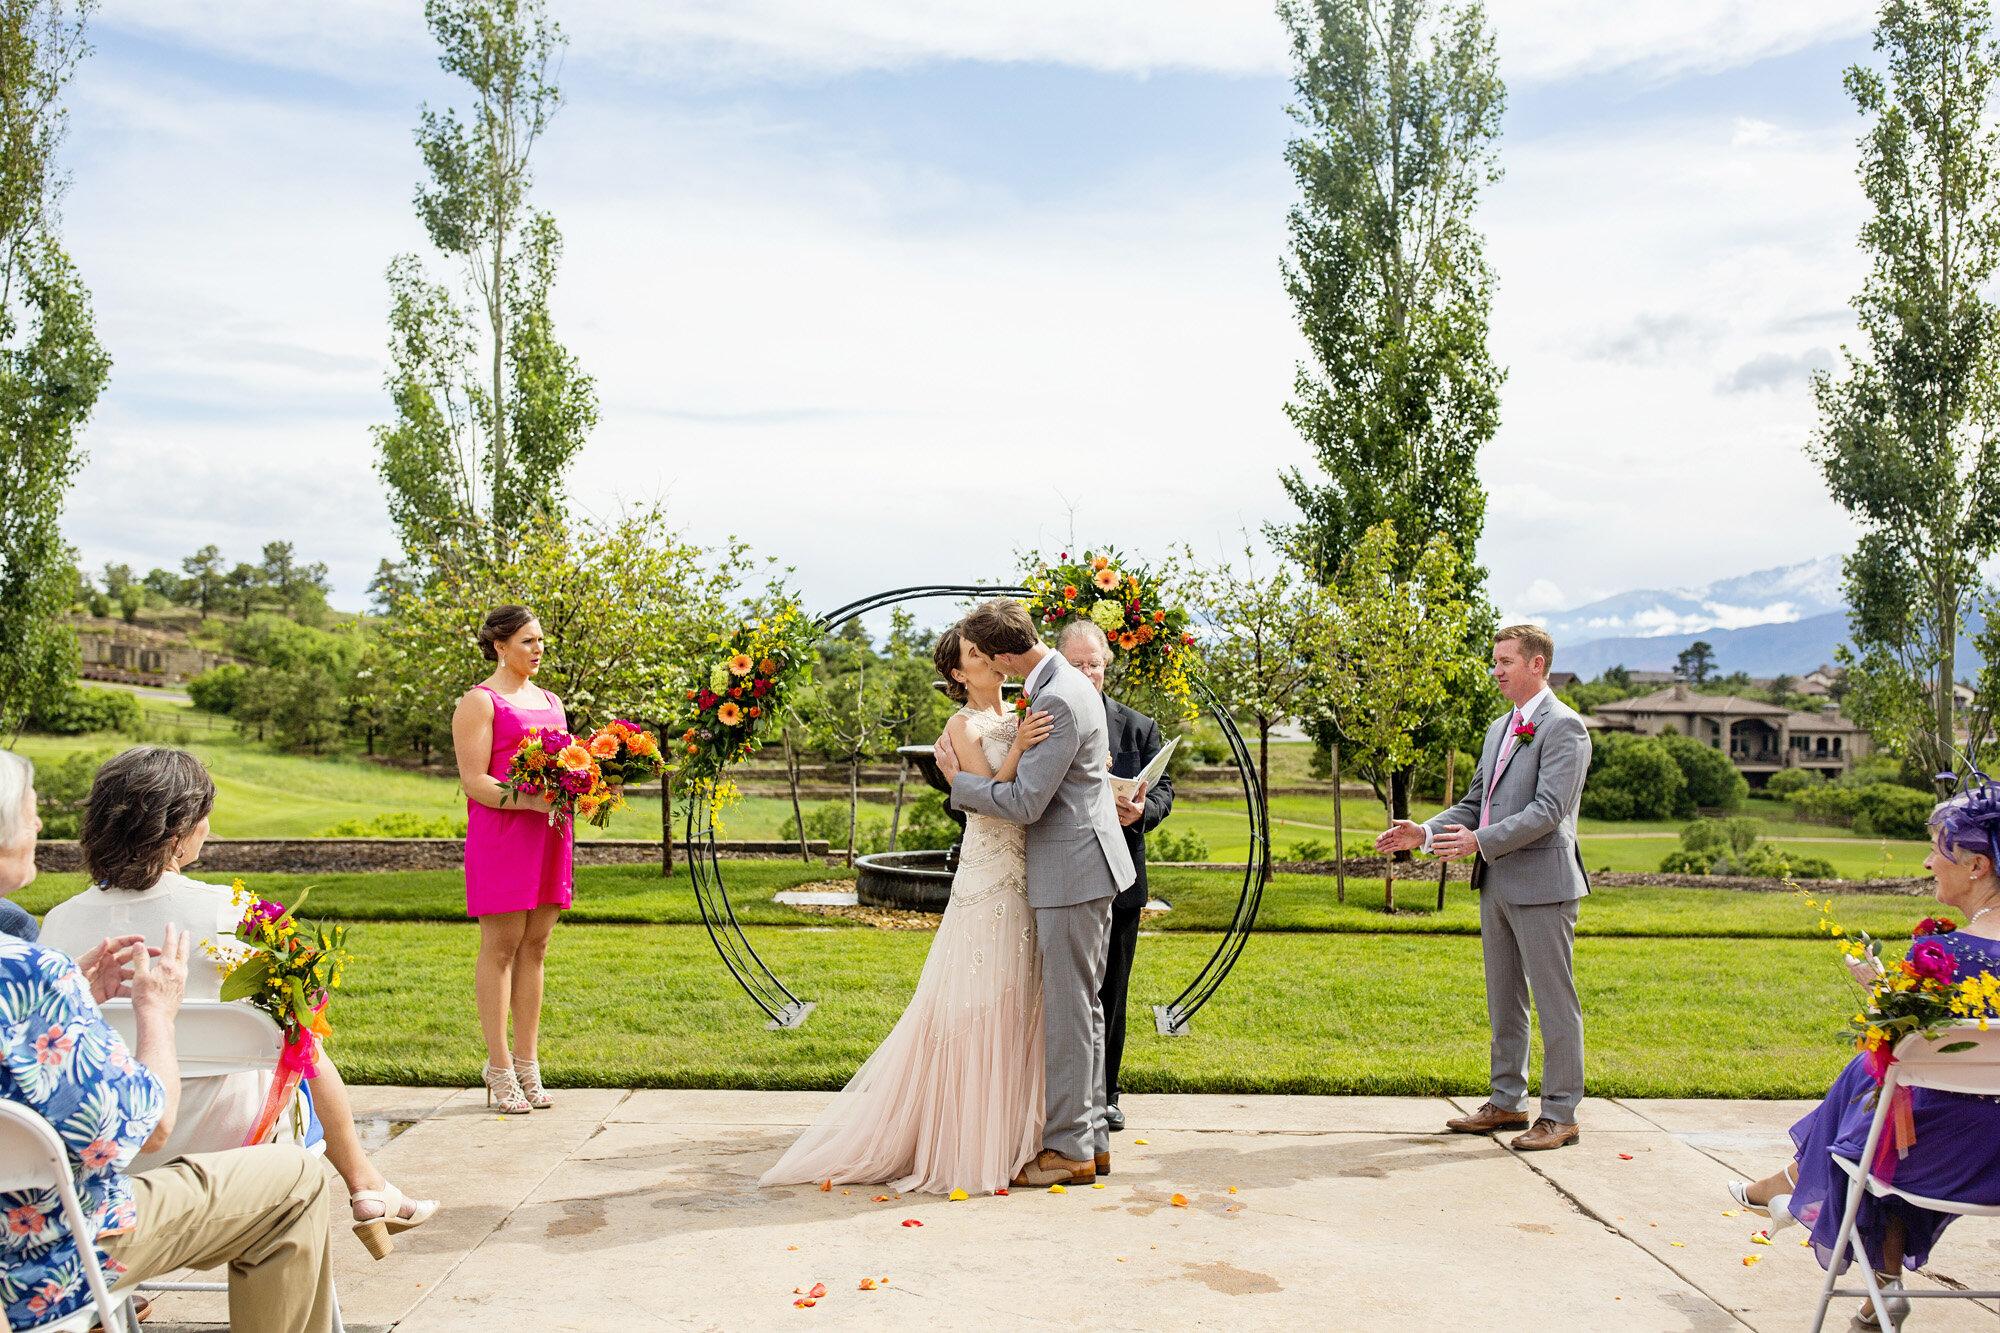 Seriously_Sabrina_Photography_Colorado_Springs_Club_at_Flying_Horse_Destination_Wedding_ODwyer59.jpg